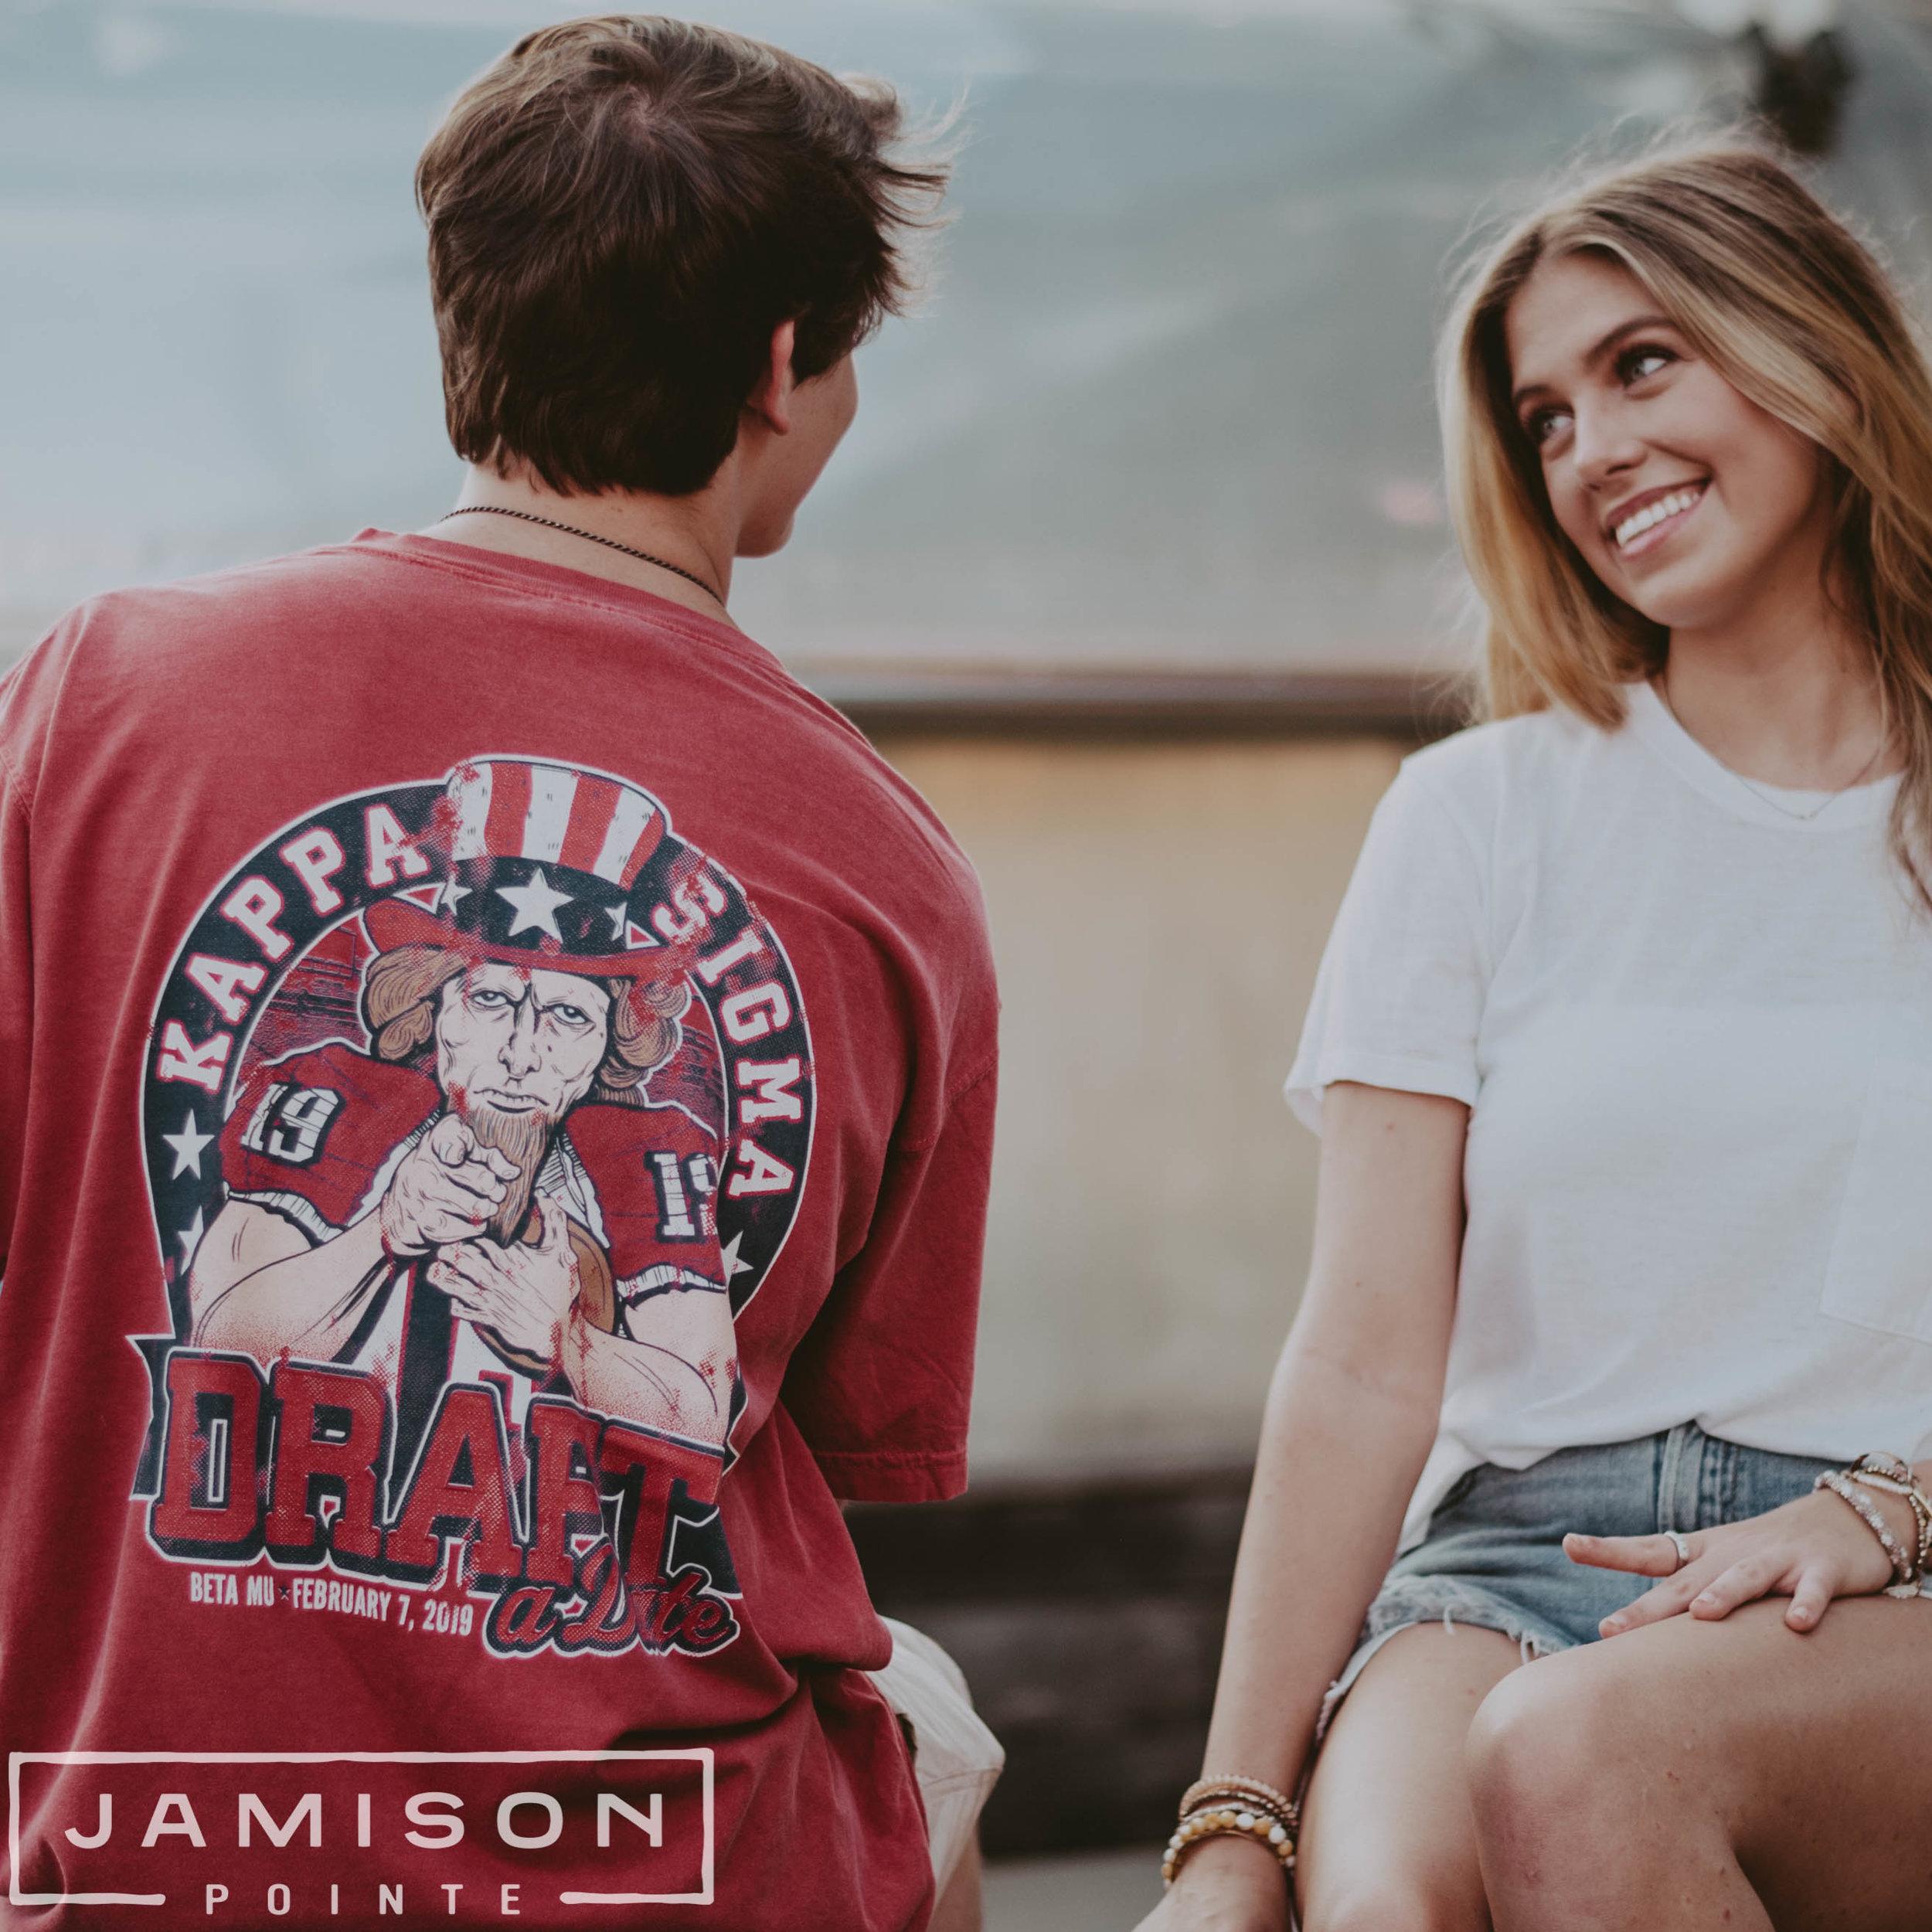 Kappa Sig Draft a Date Tshirt